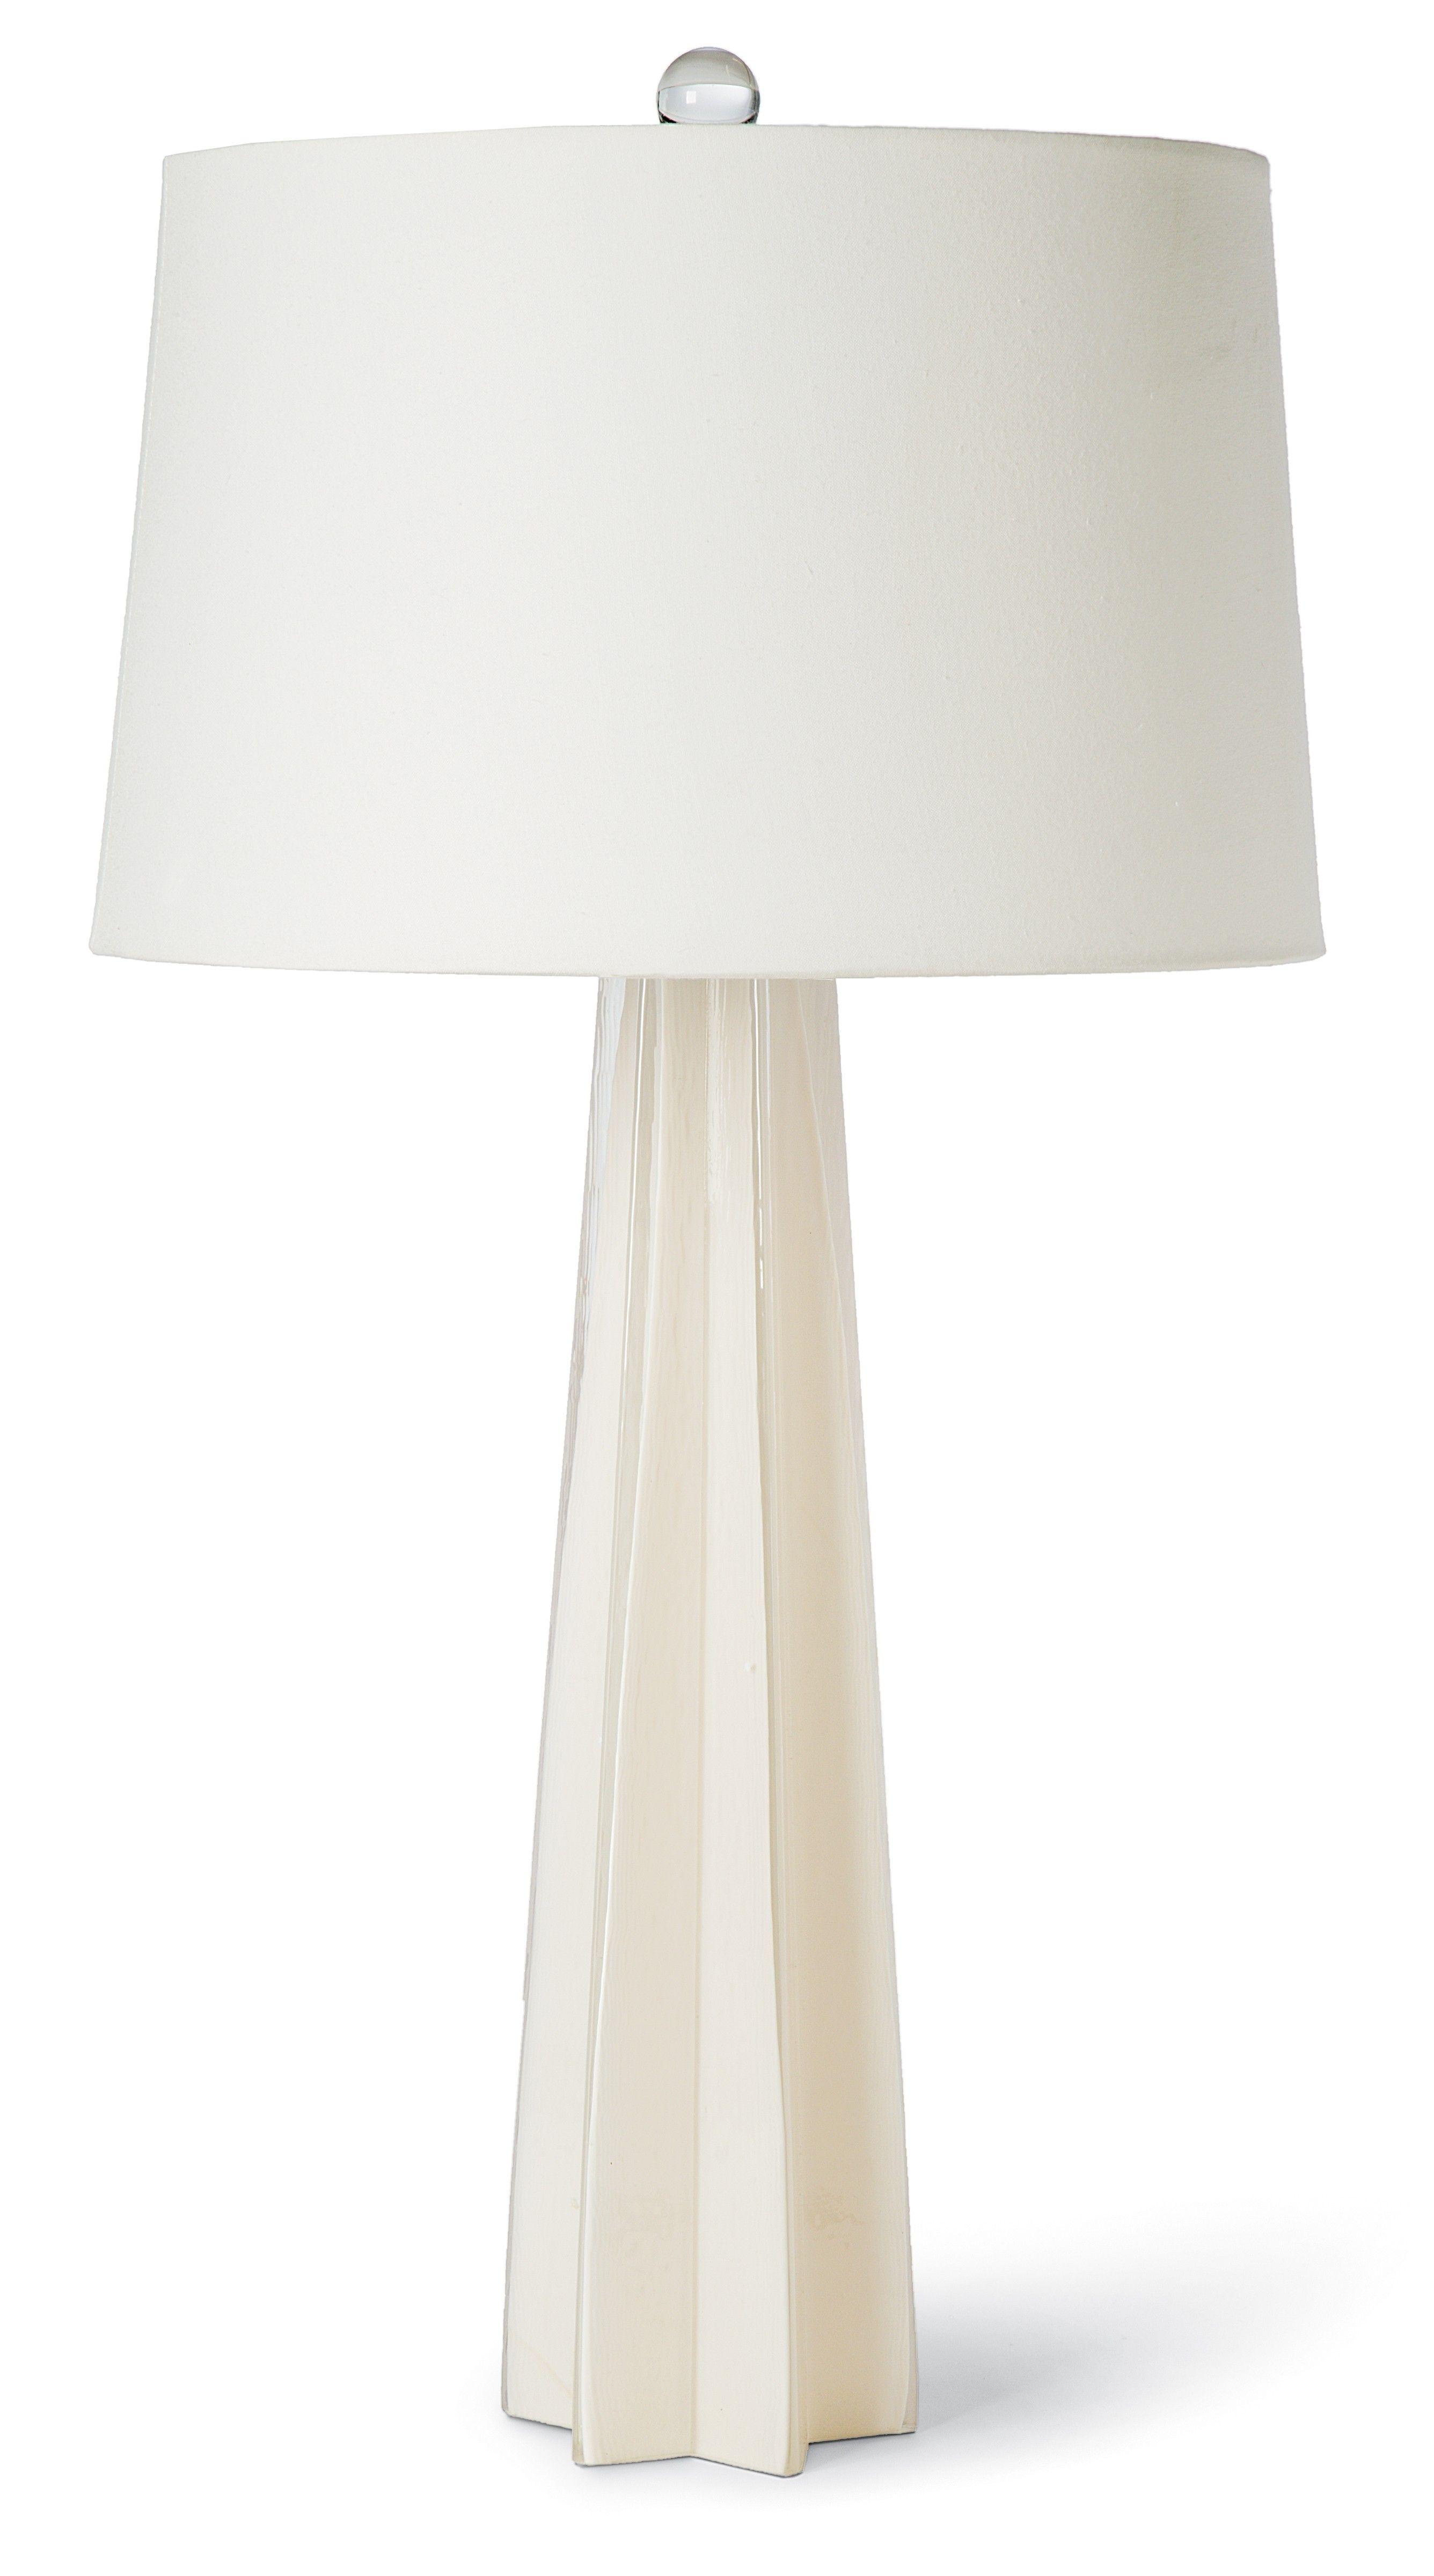 Klara Table Lamp Contemporary Table Lamps Lamps Living Room